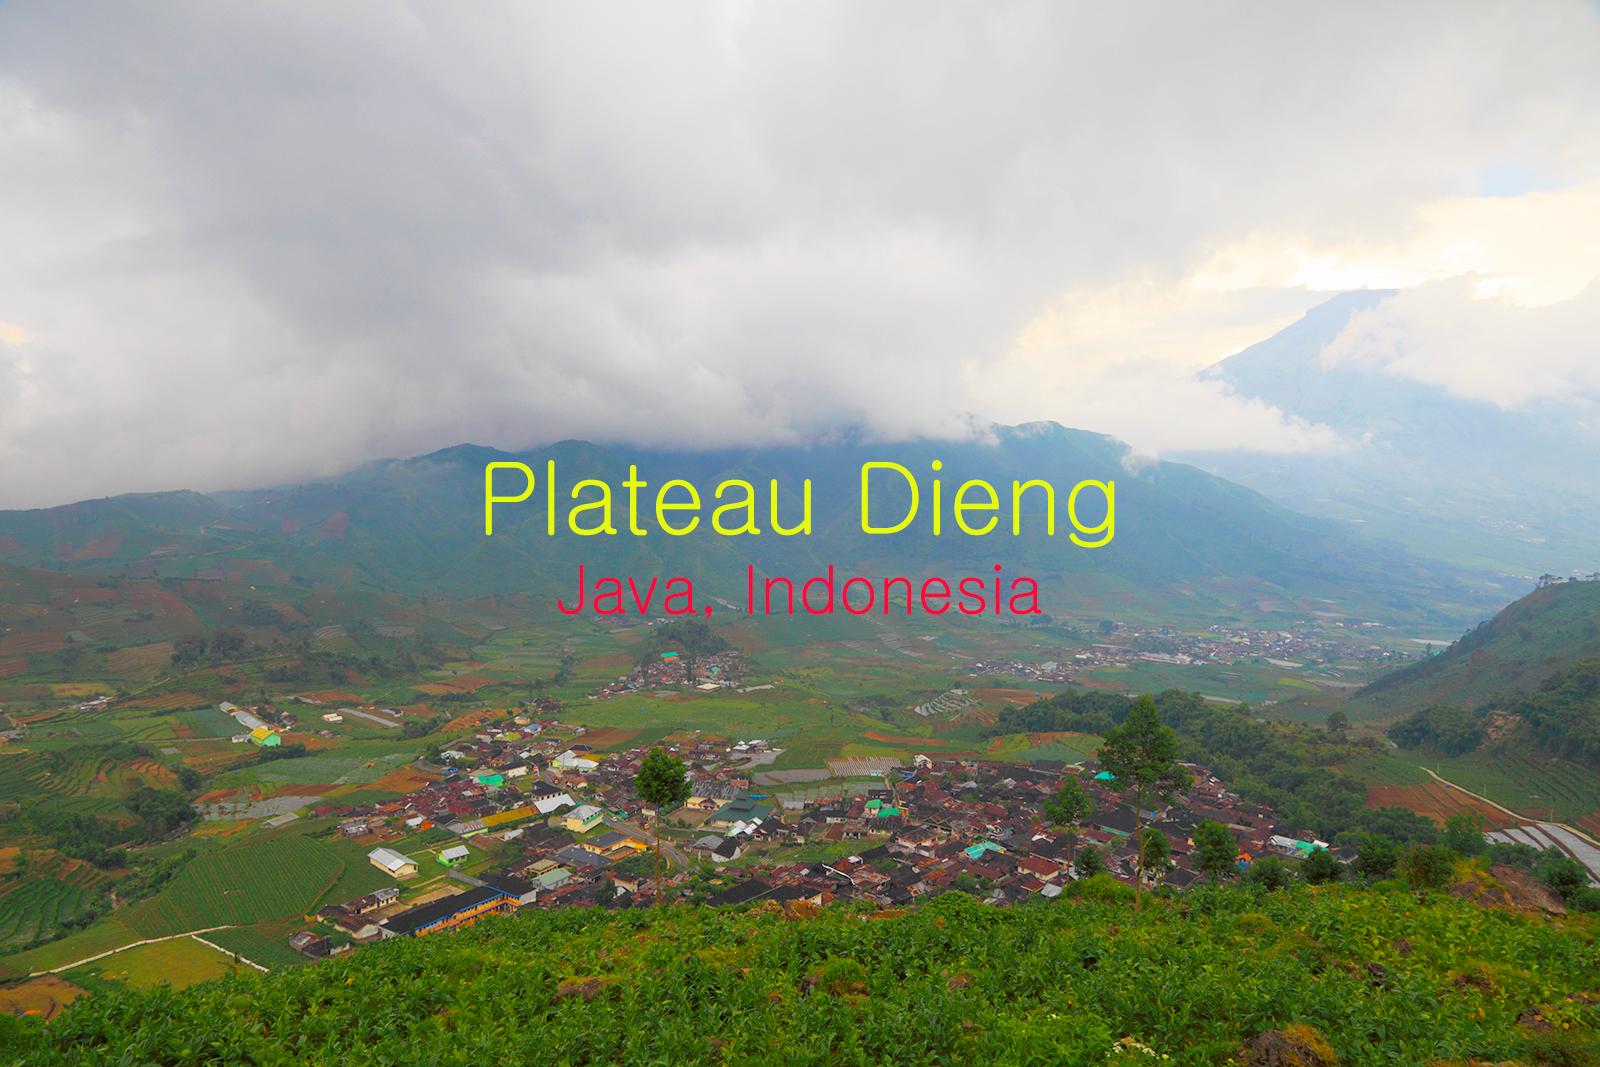 Видео экскурсия на Плато Диенг